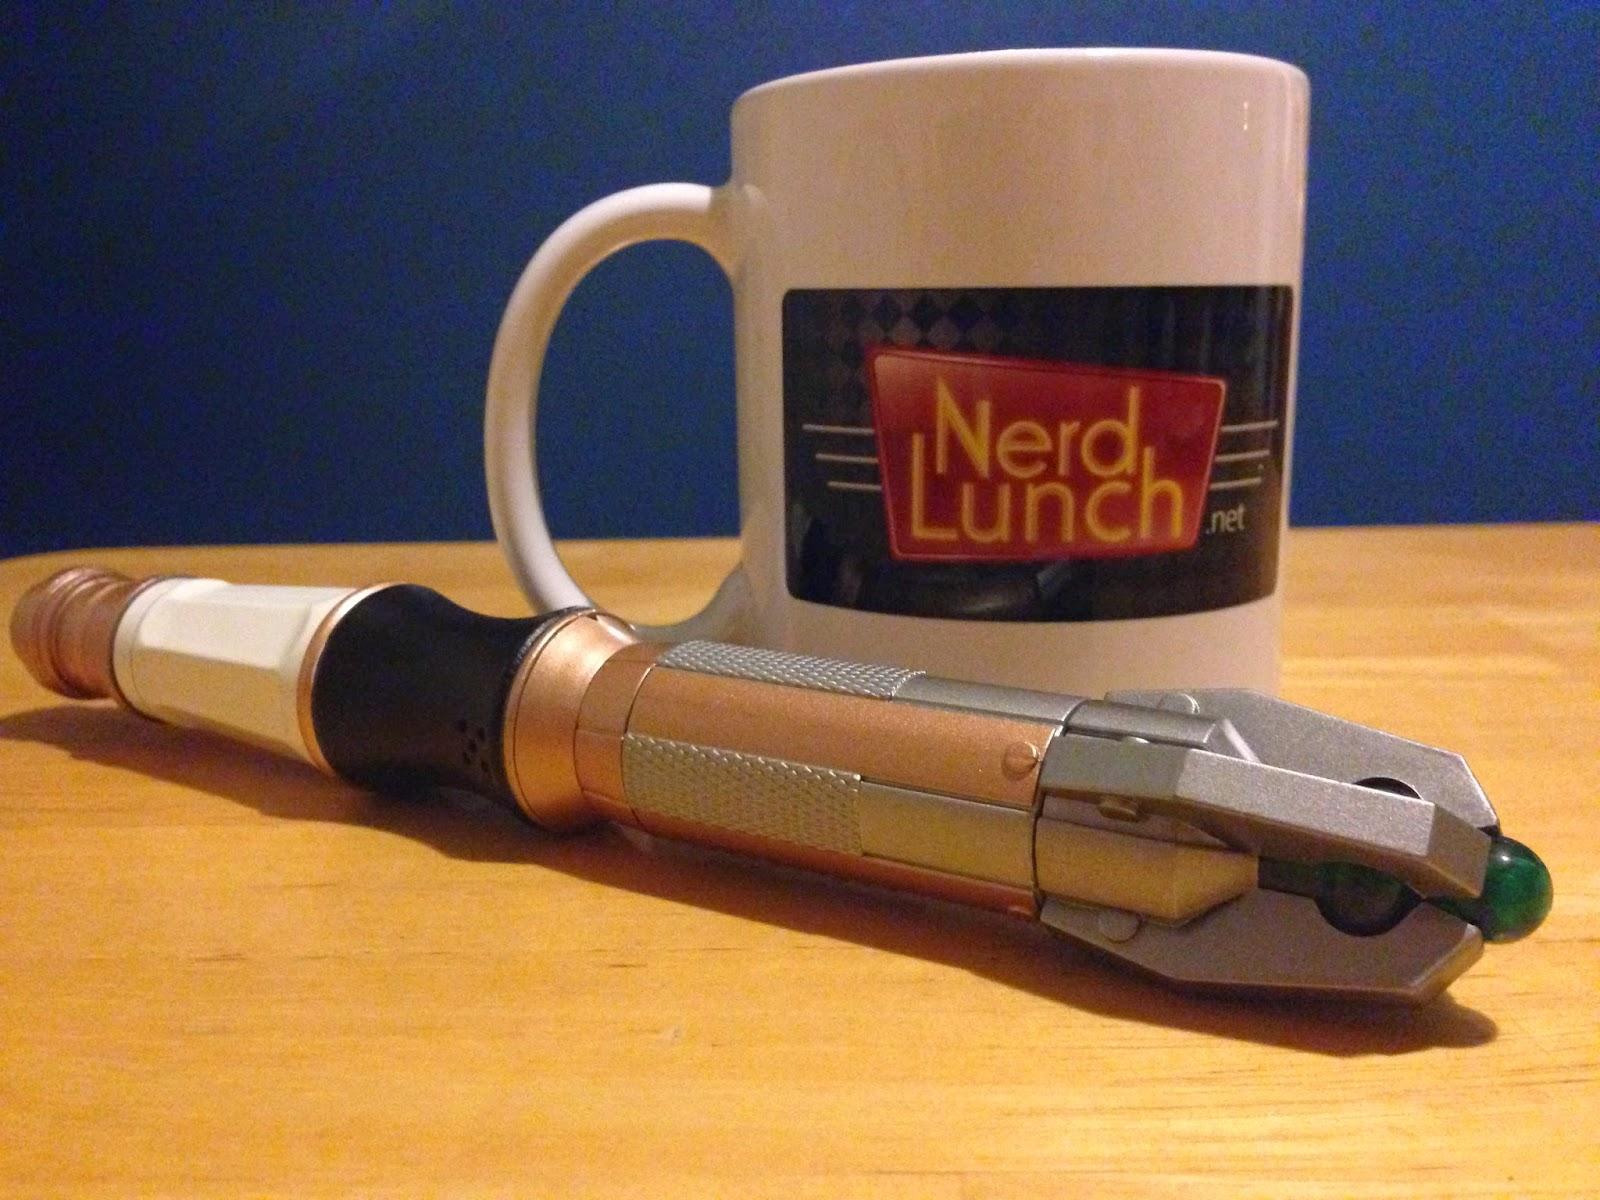 Nerd Lunch sonic screwdriver